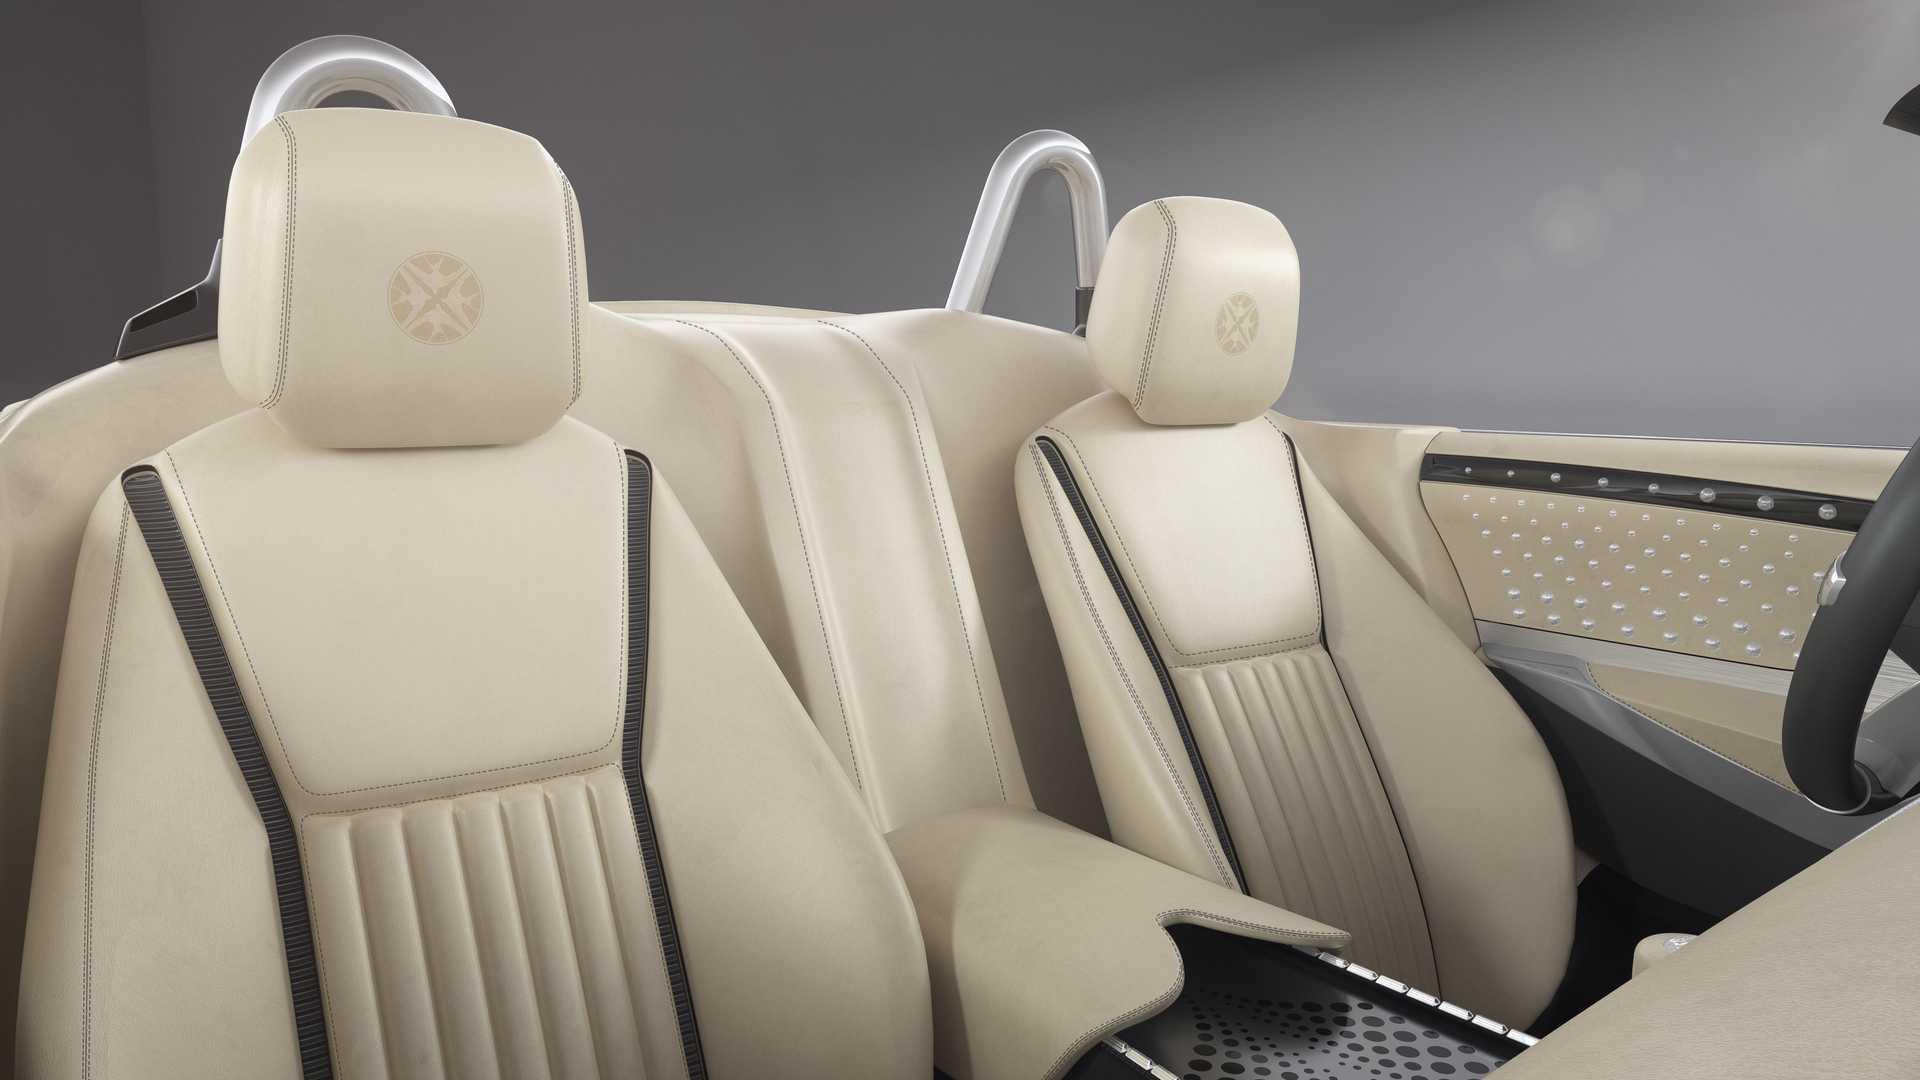 Ares-Design-Wami-Lalique-Spyder-24